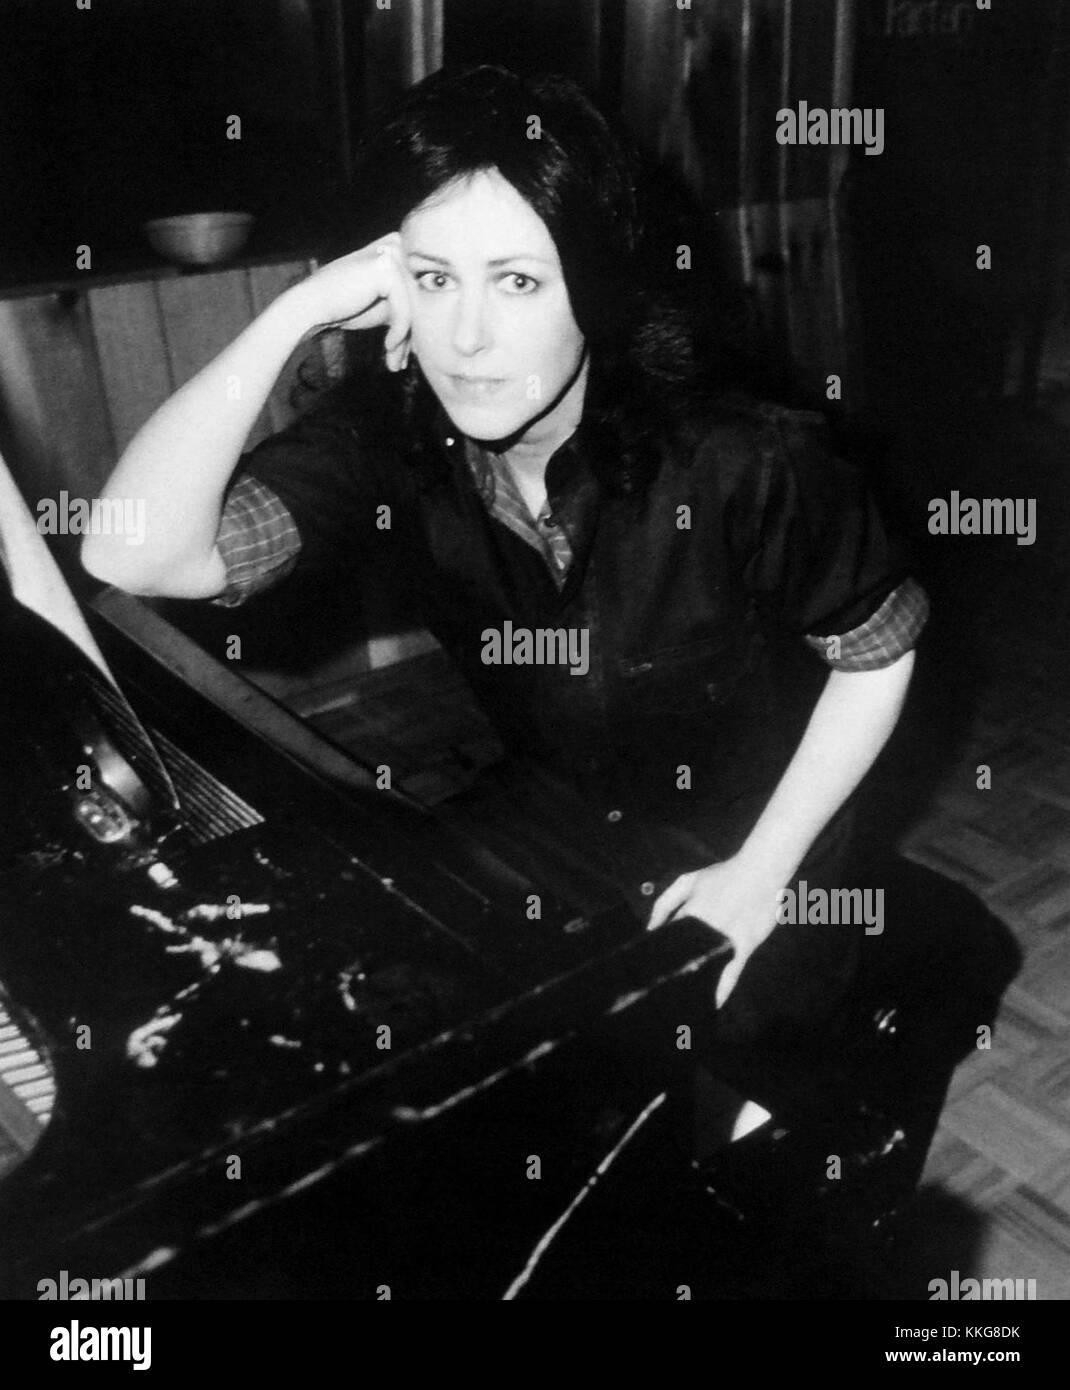 Grace Slick RCA records publicity photo - Stock Image